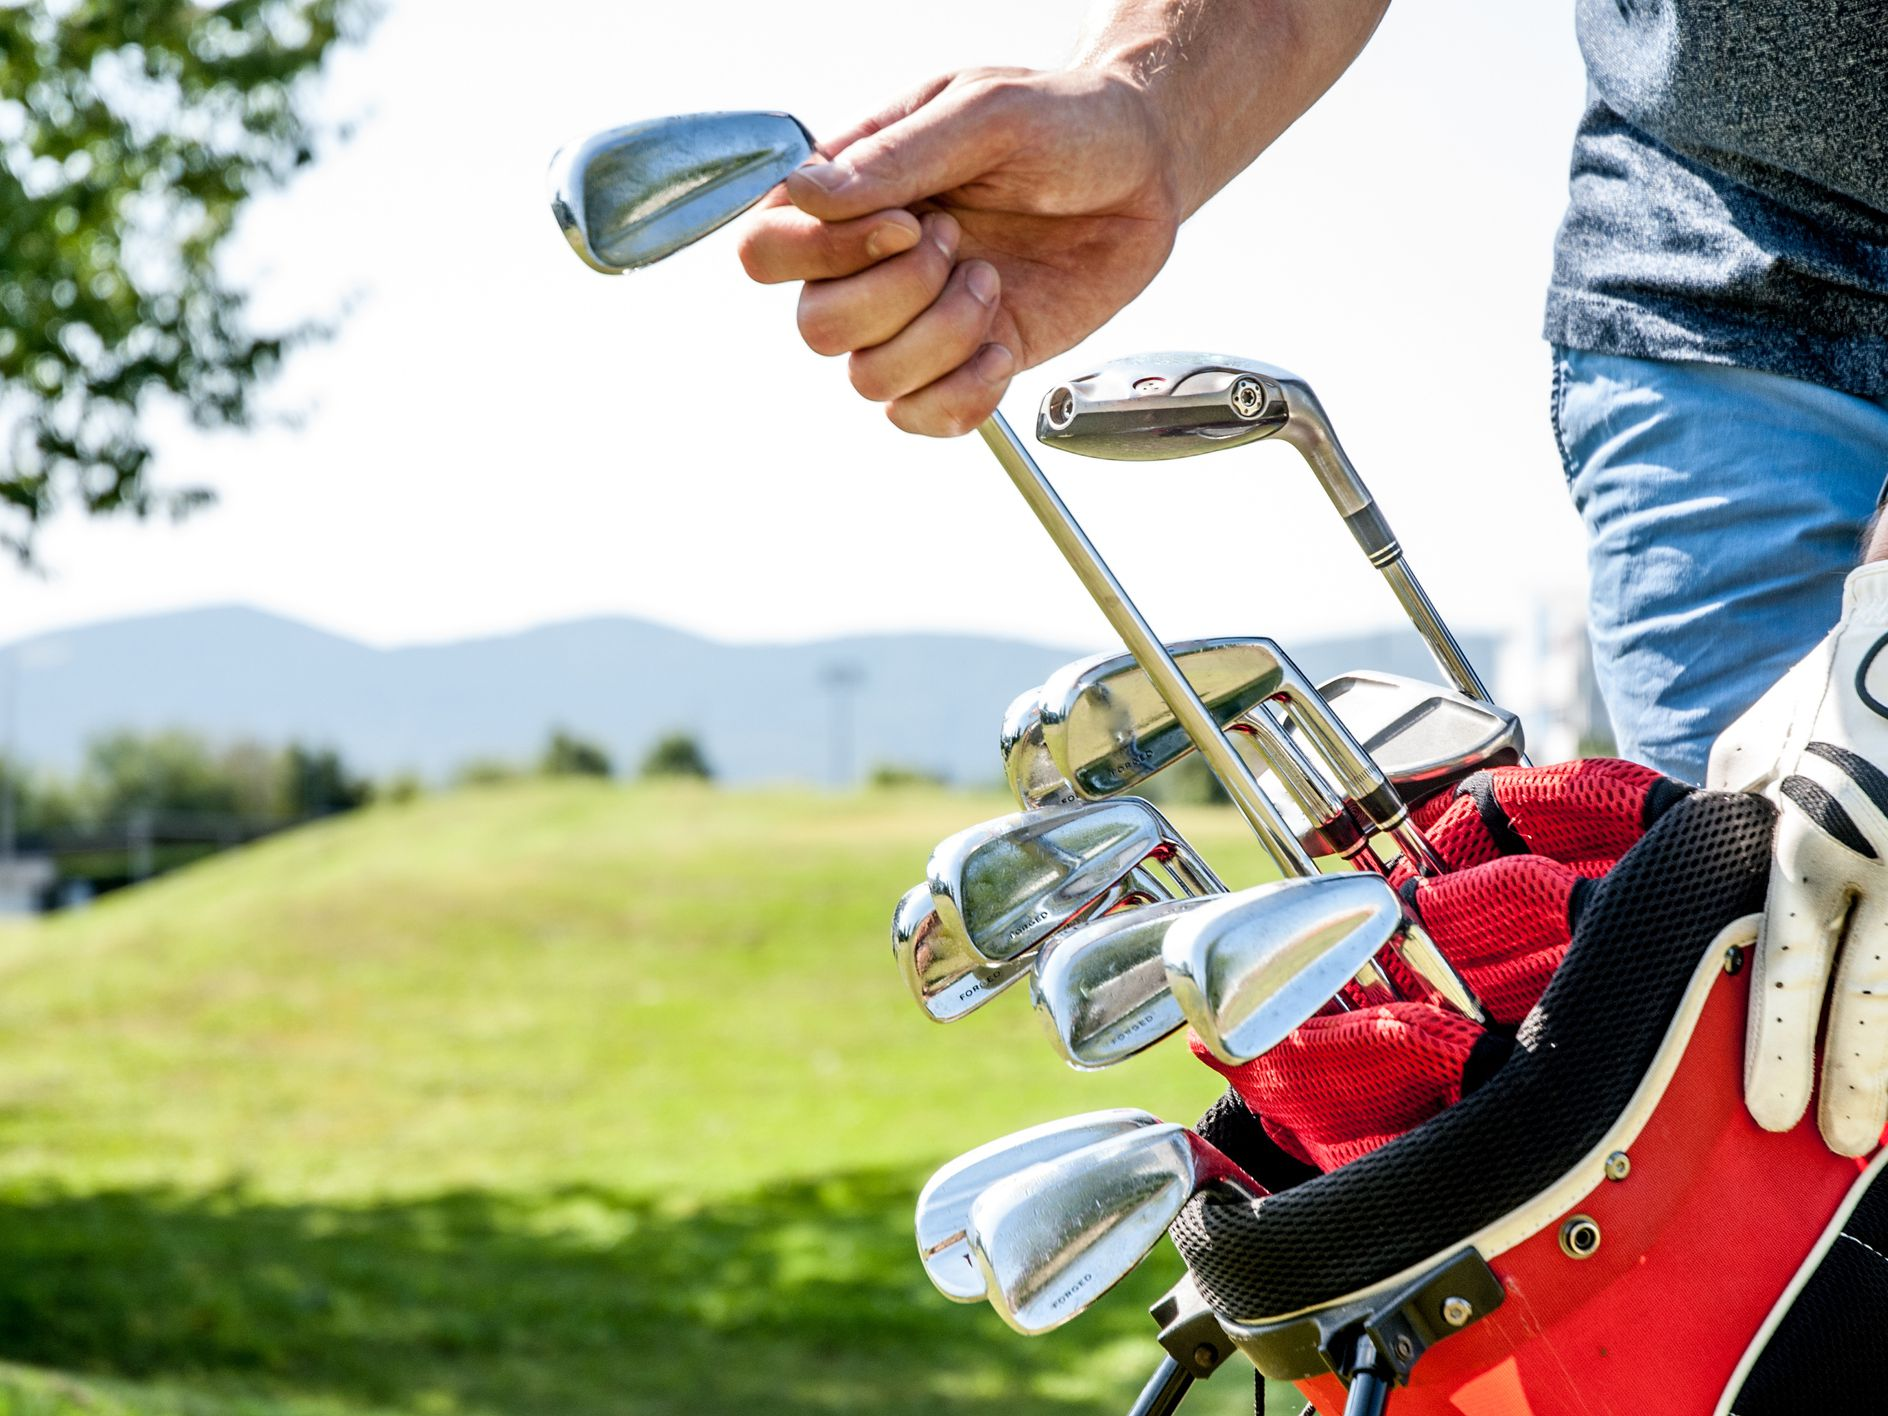 best golf irons 2017 for mid handicap